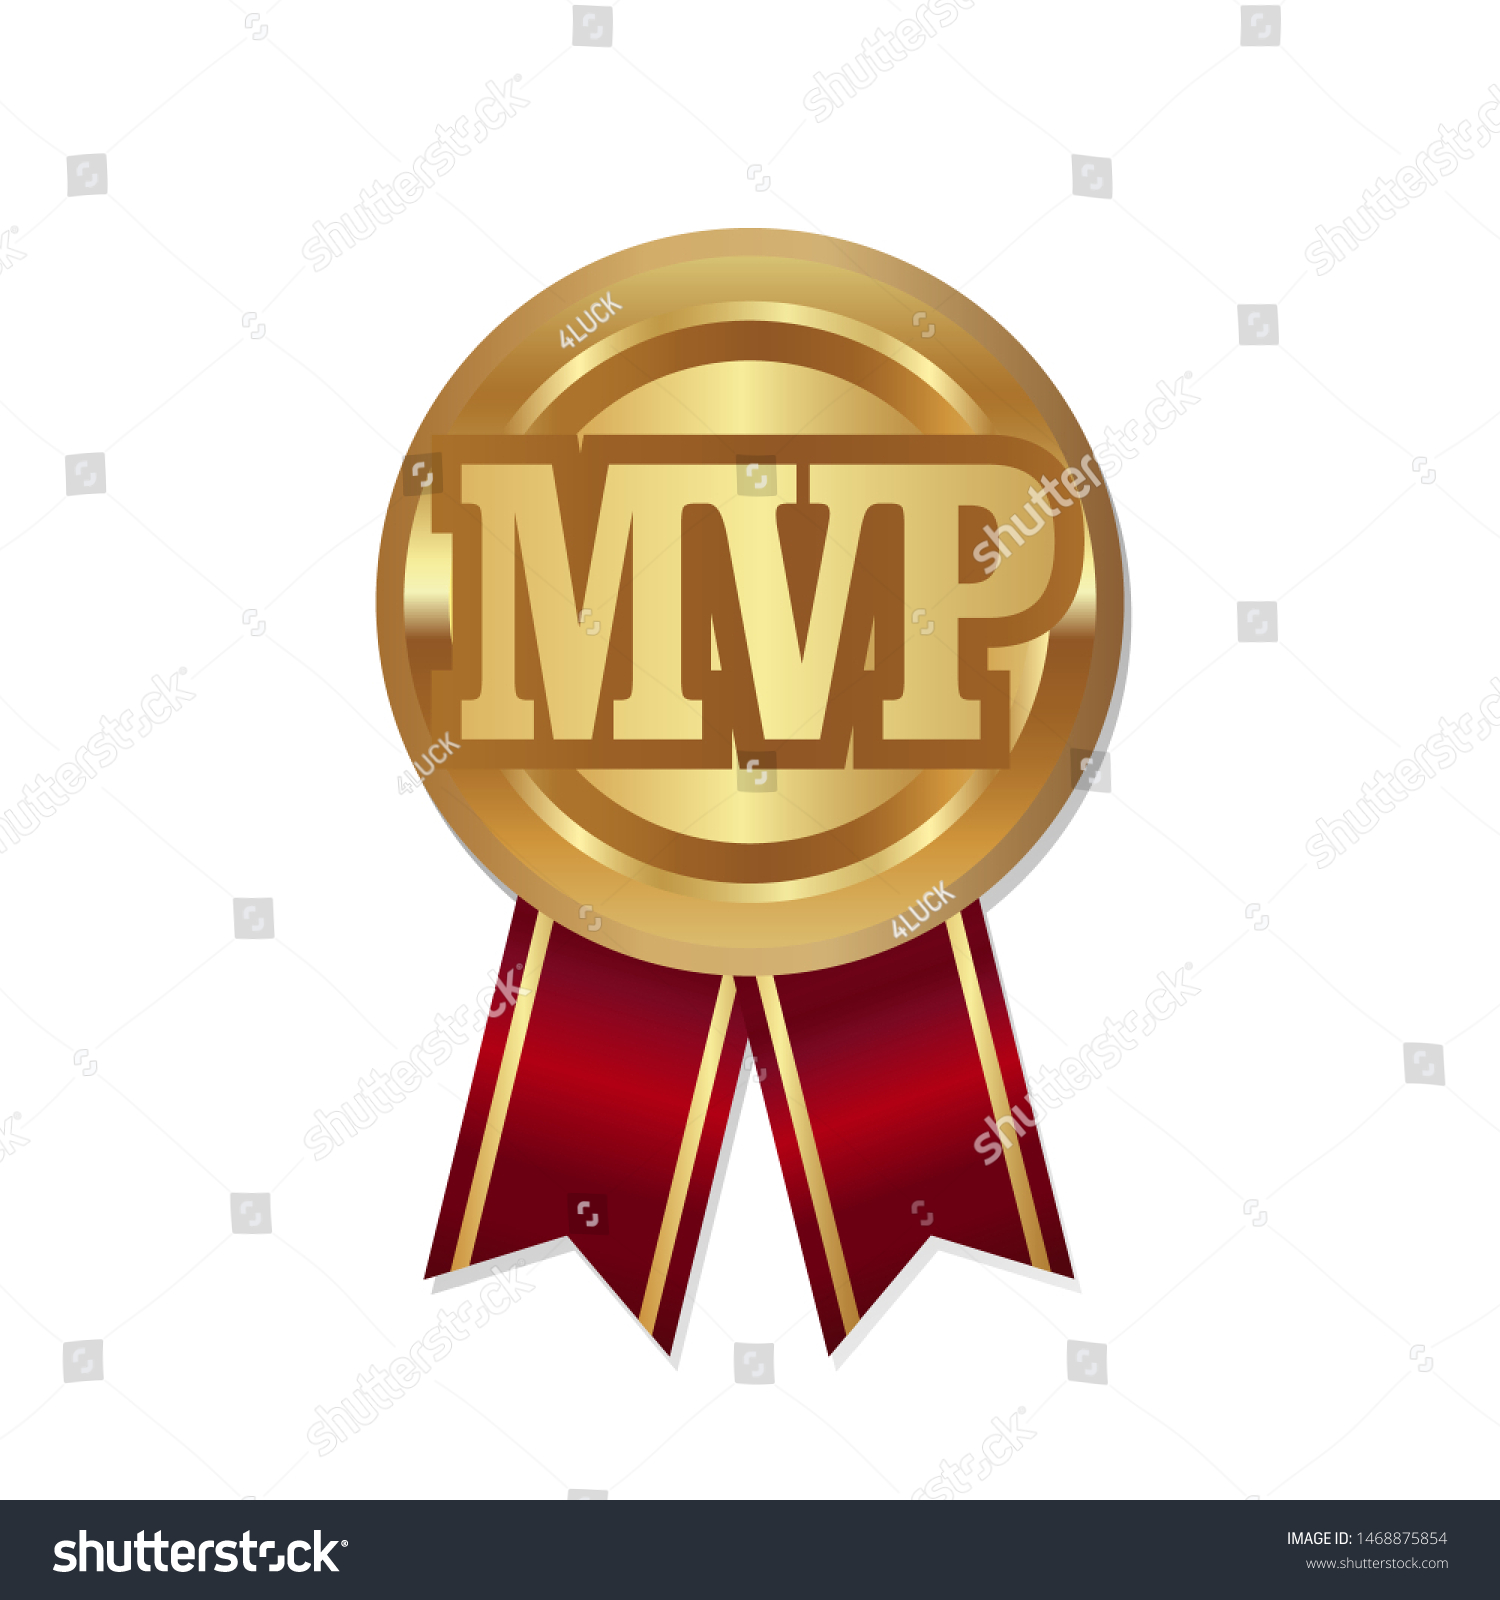 Mvp Medal with Ribbon